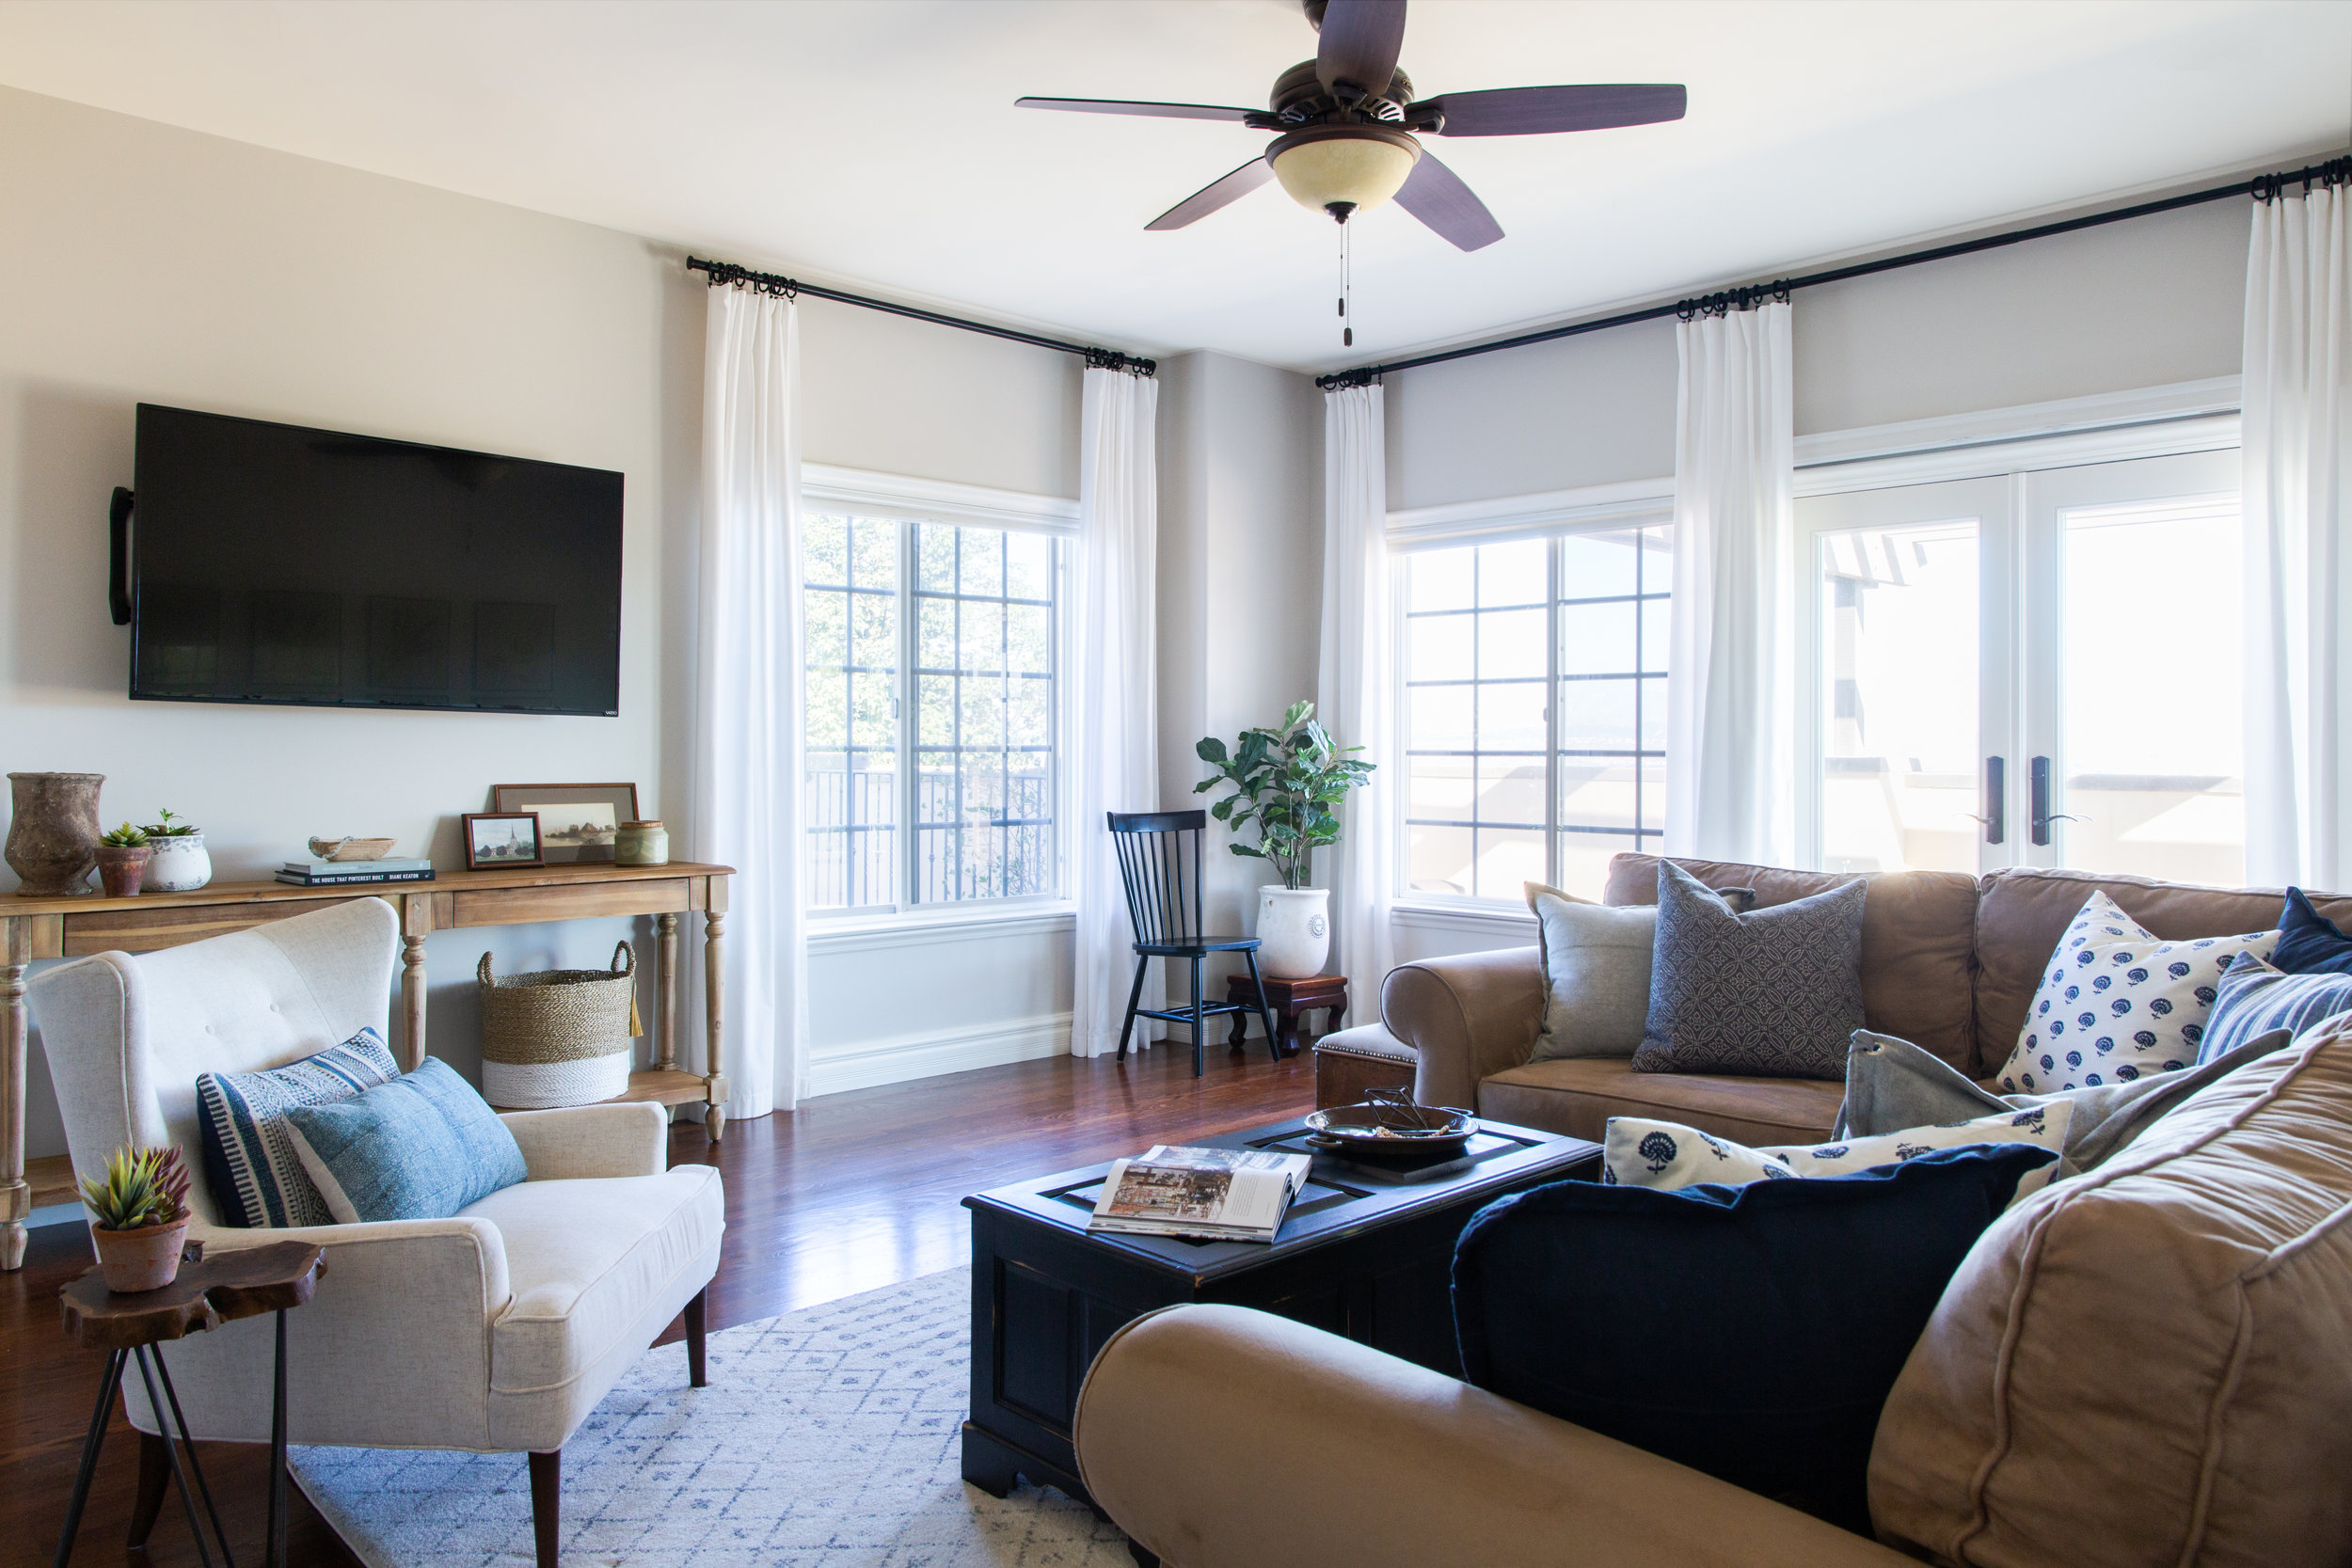 Riverrun Lounge Refresh - Sundling Studio - Interior Artistry and Design in California.